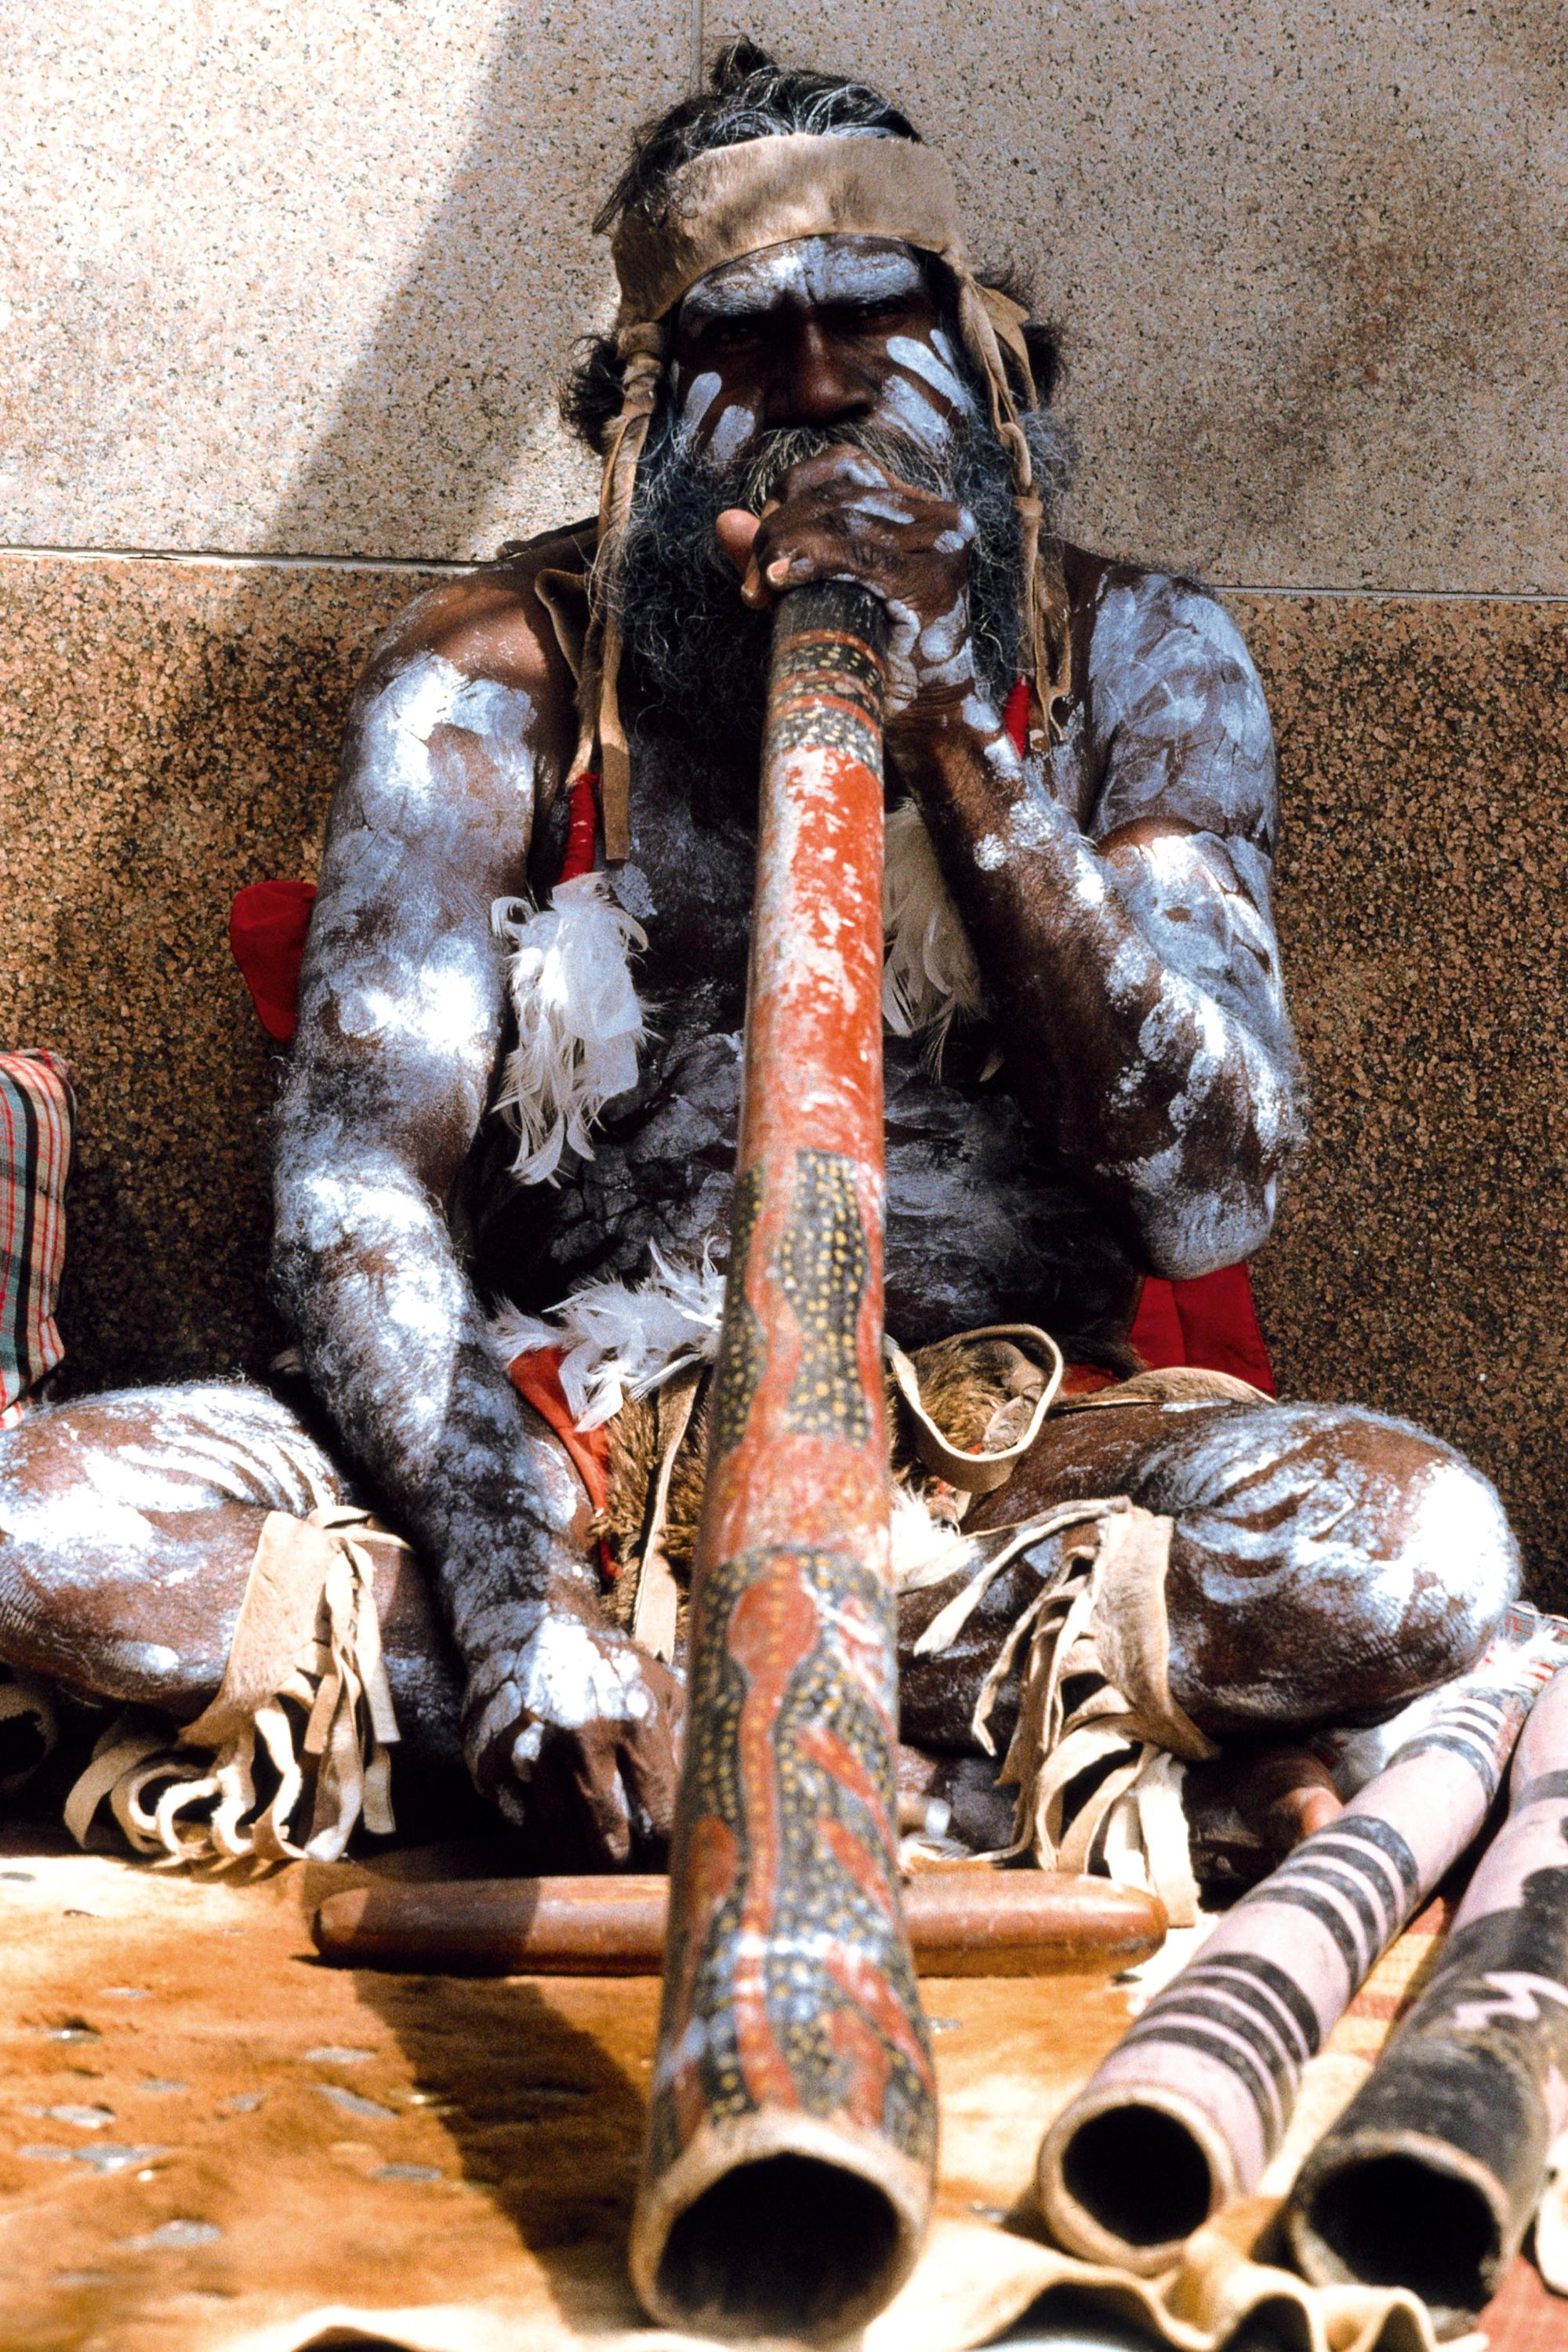 A didgeridoo player